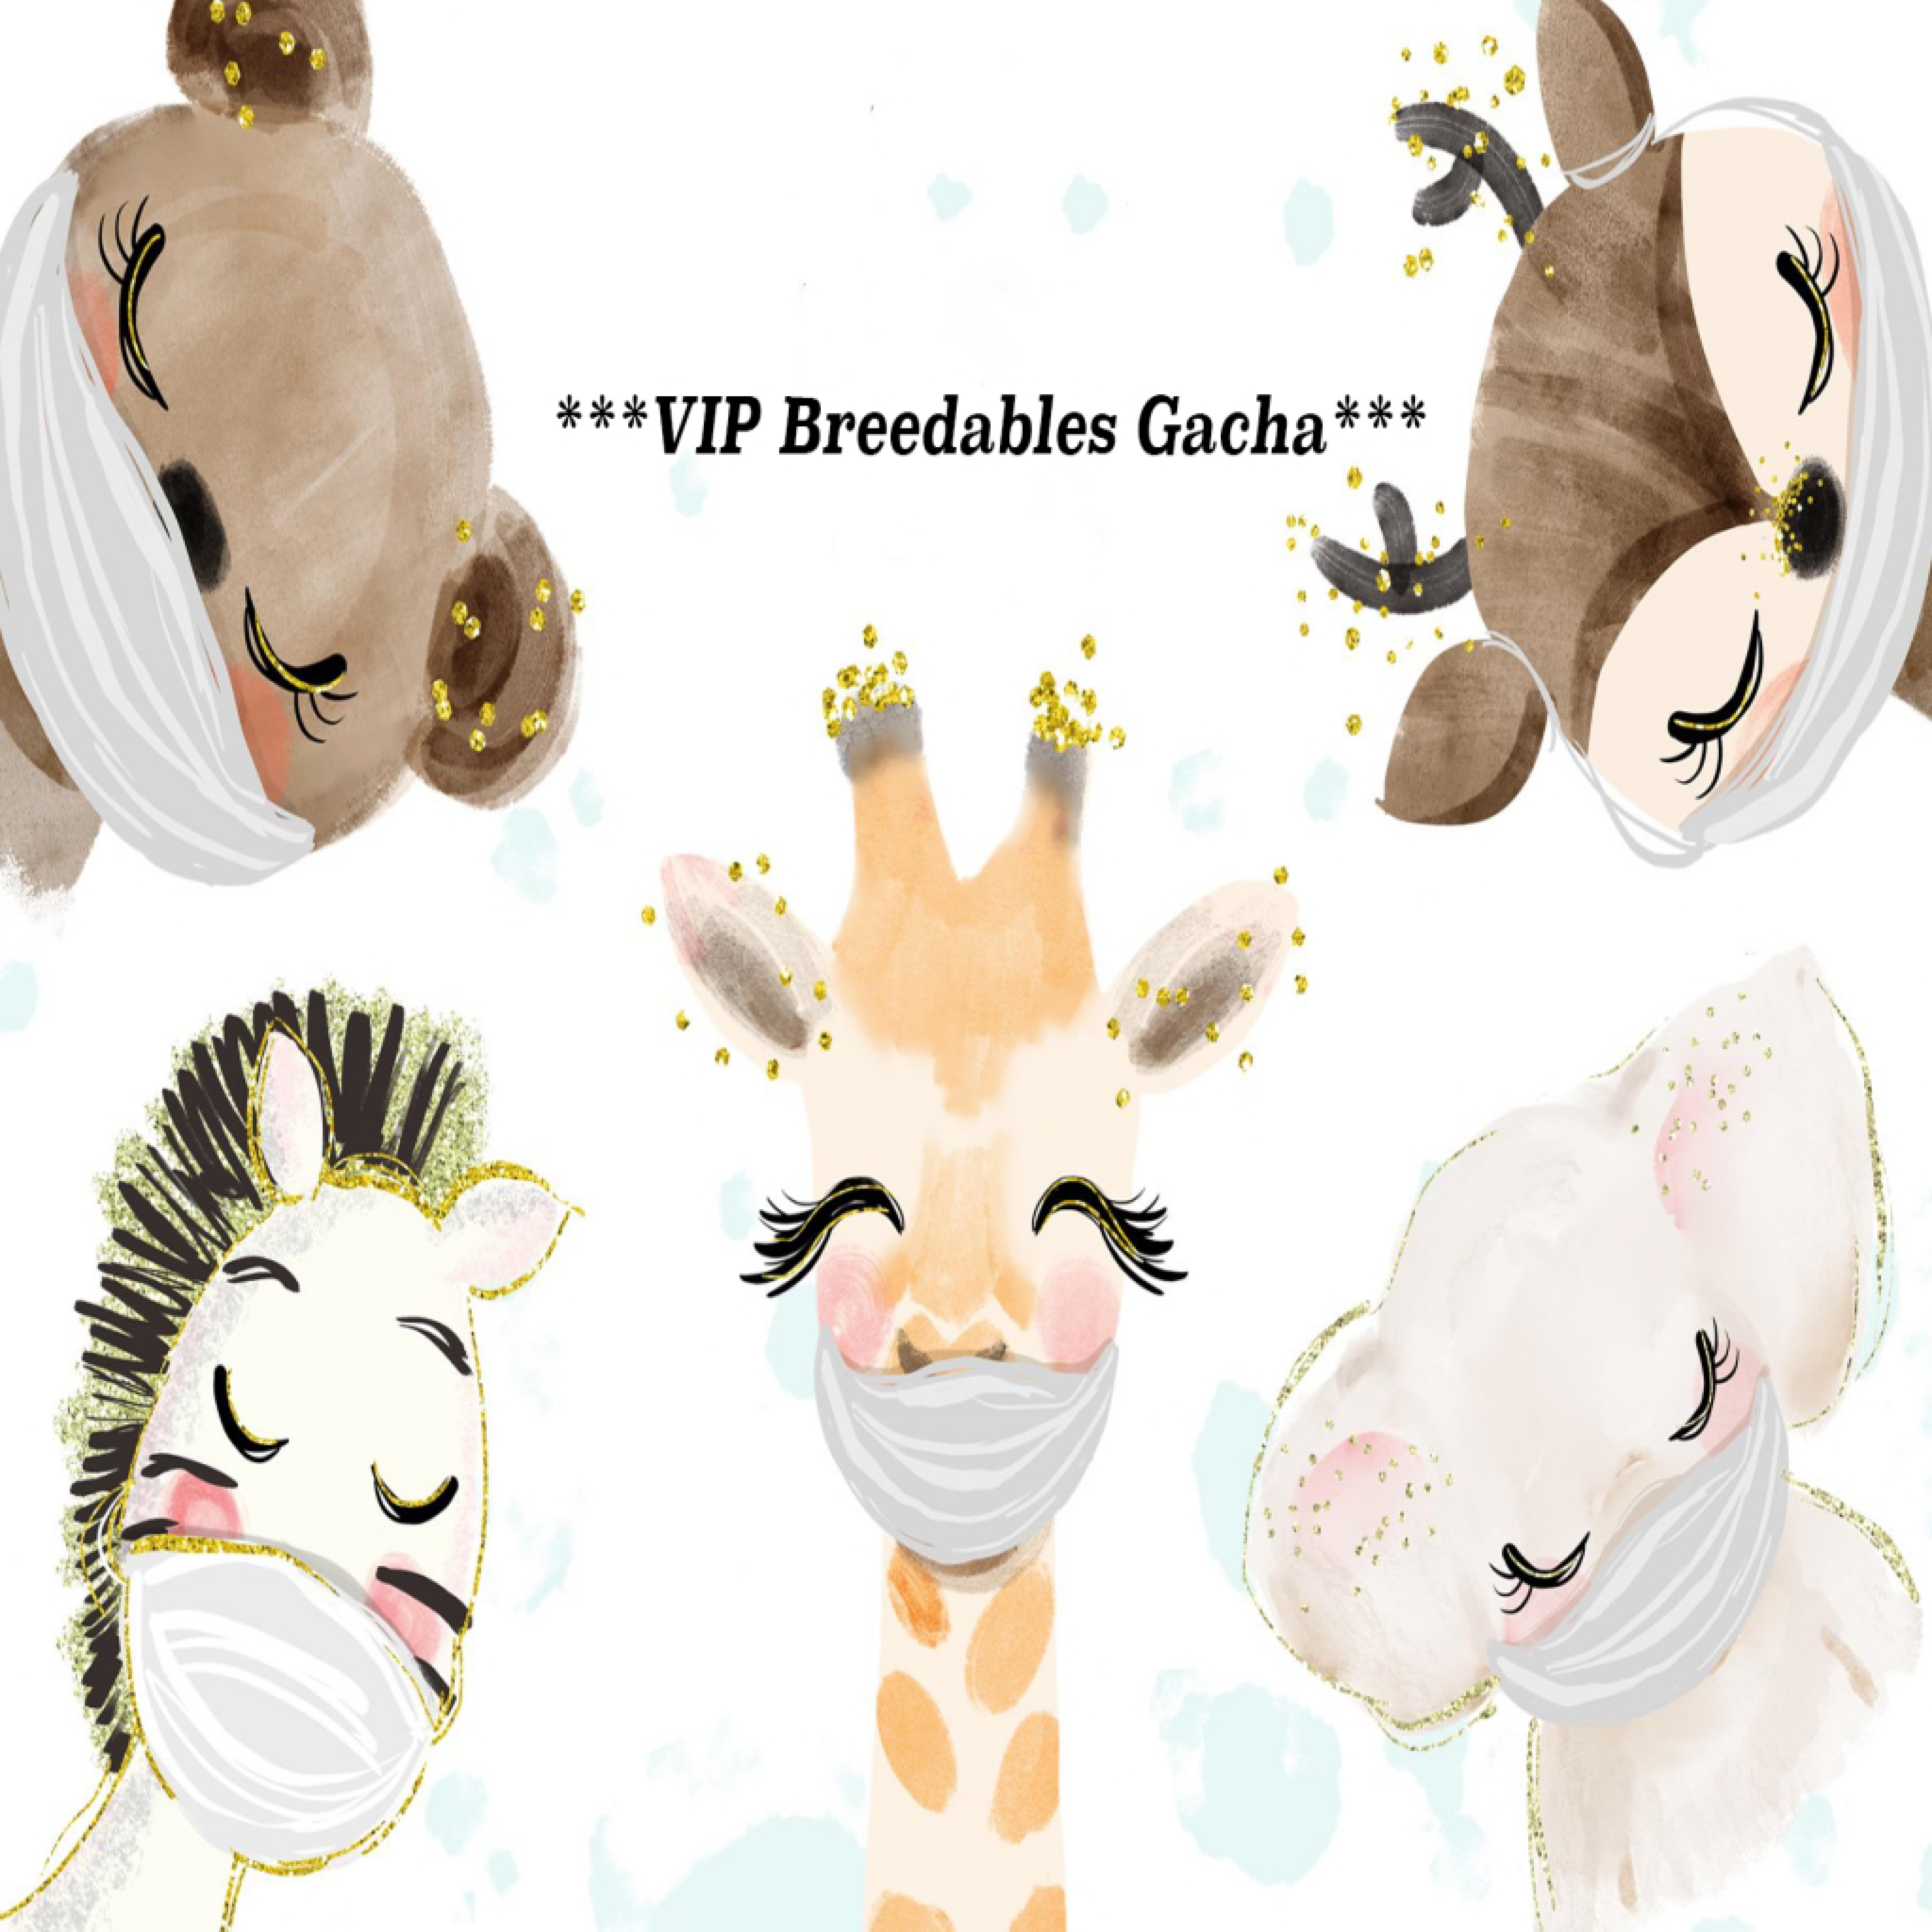 ***VIP Breedables Gacha***